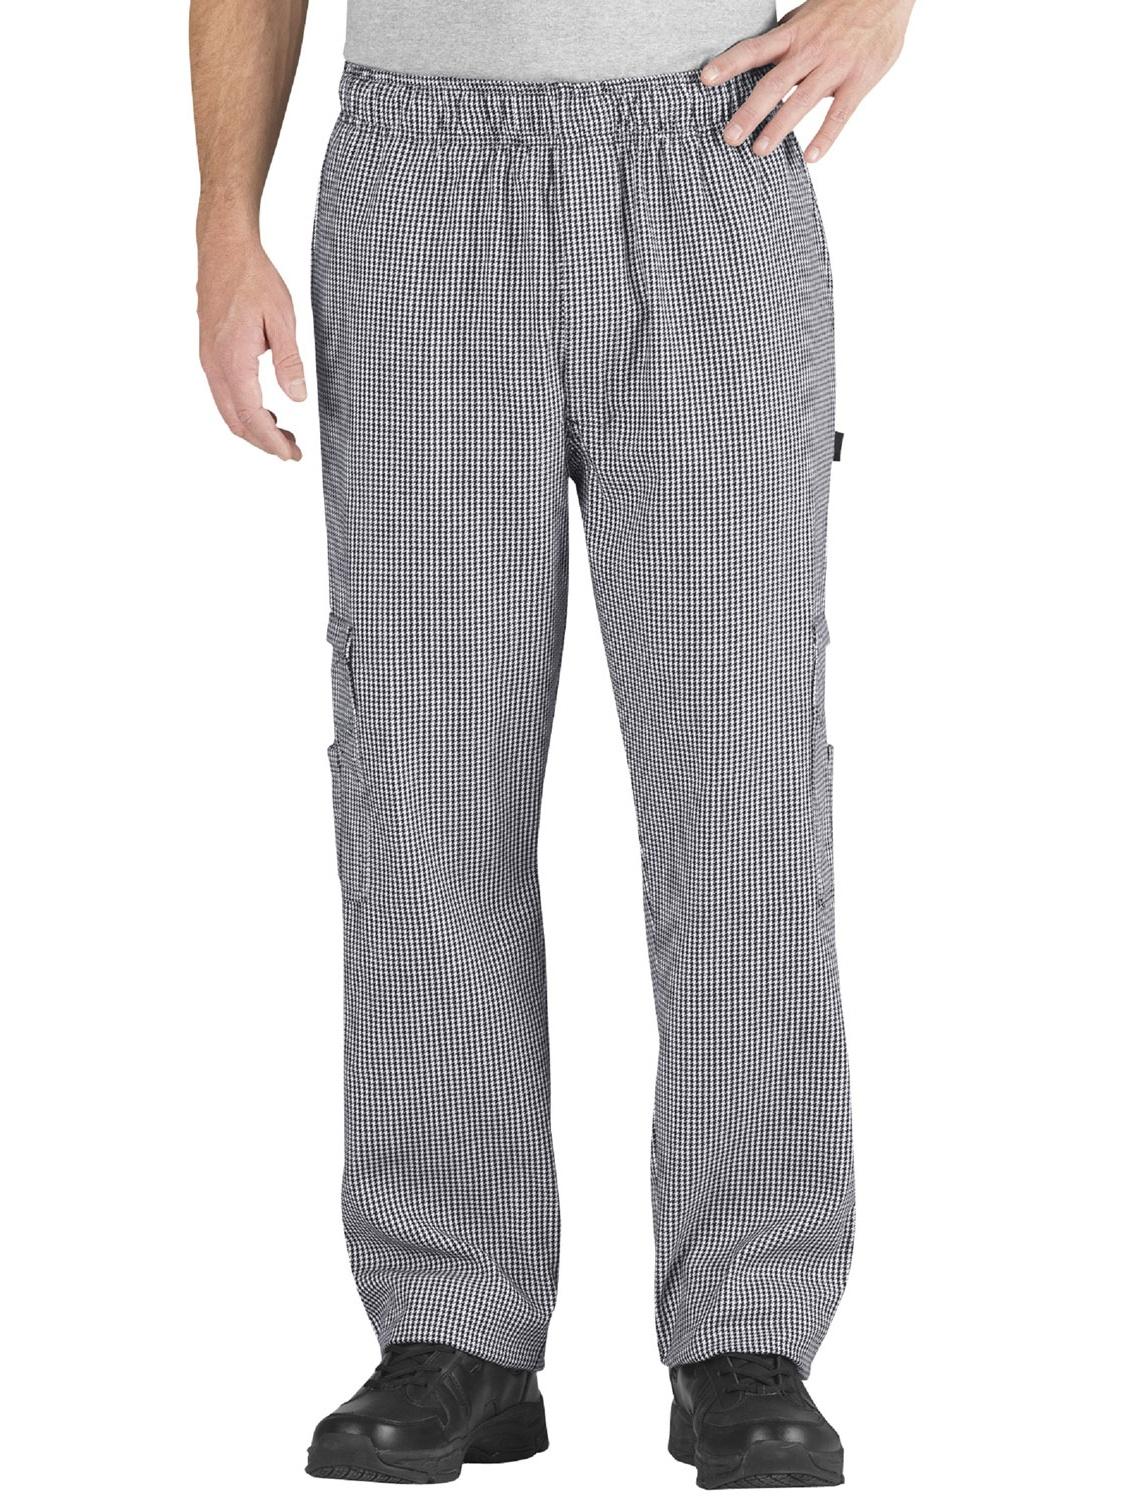 CHEF CODE Cargo Chef Pants, Elastic Waist with Drawstring CC202